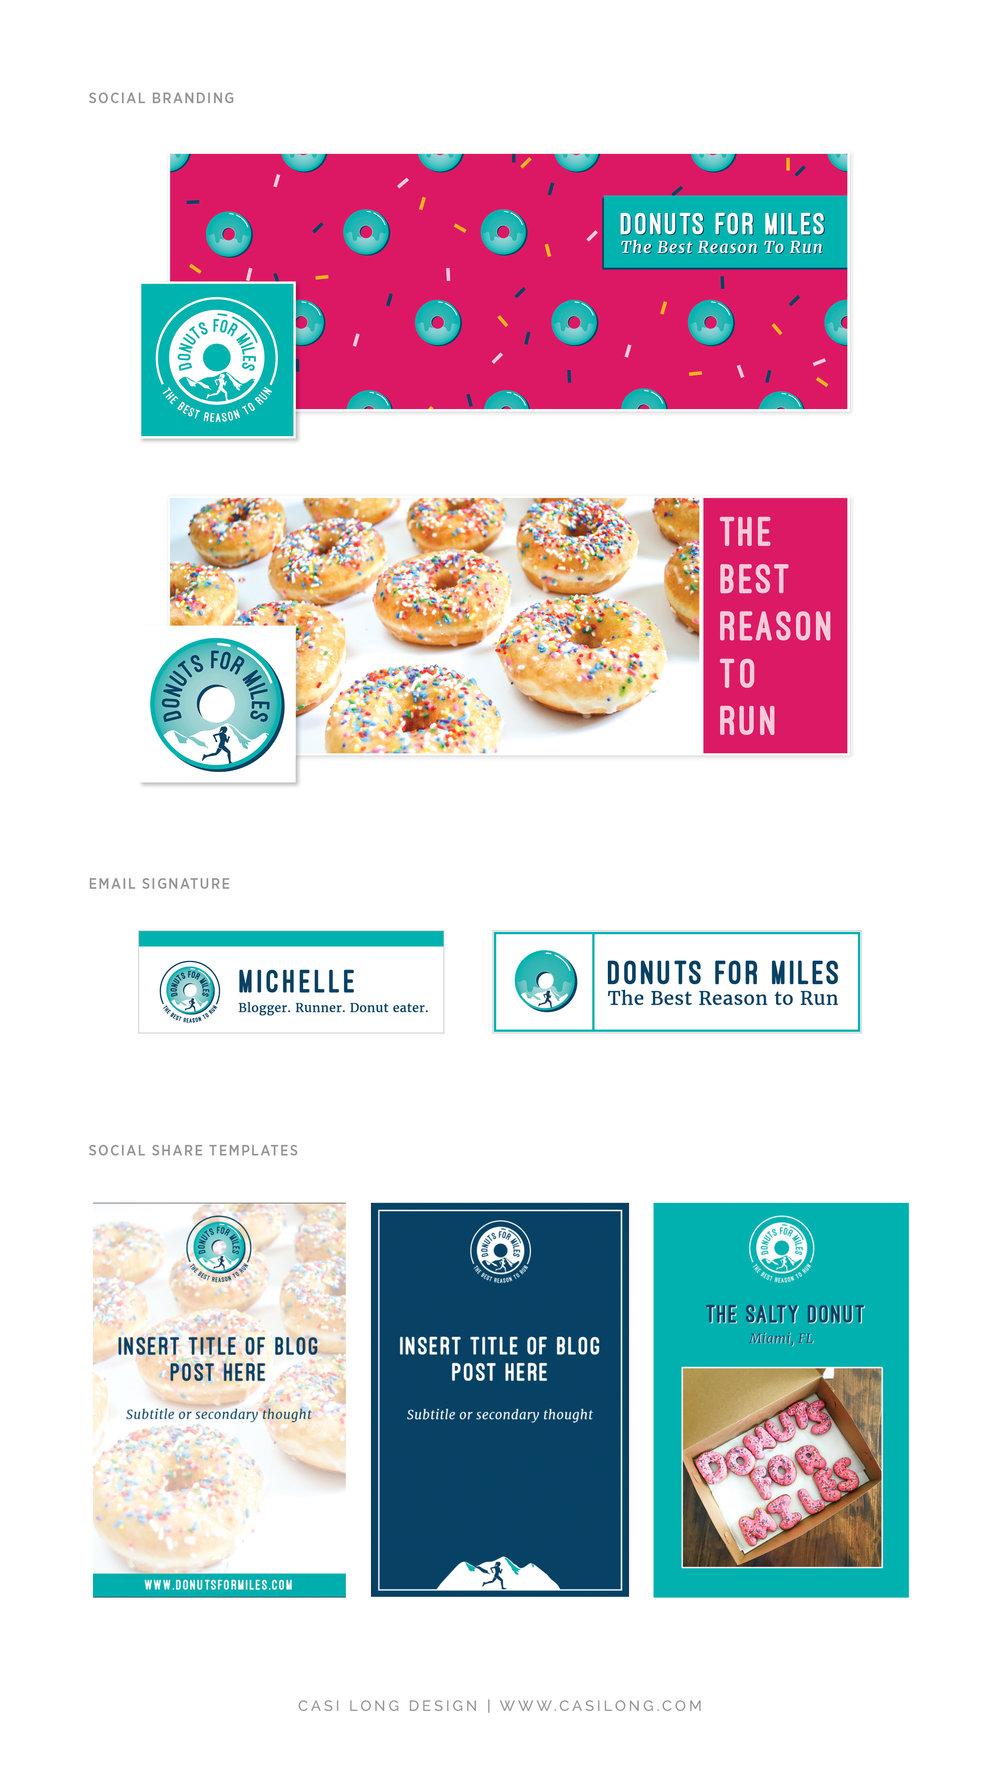 Social Media Branding Donuts for Miles   Branding by Casi Long Design   www.casilong.com #casilongdesign